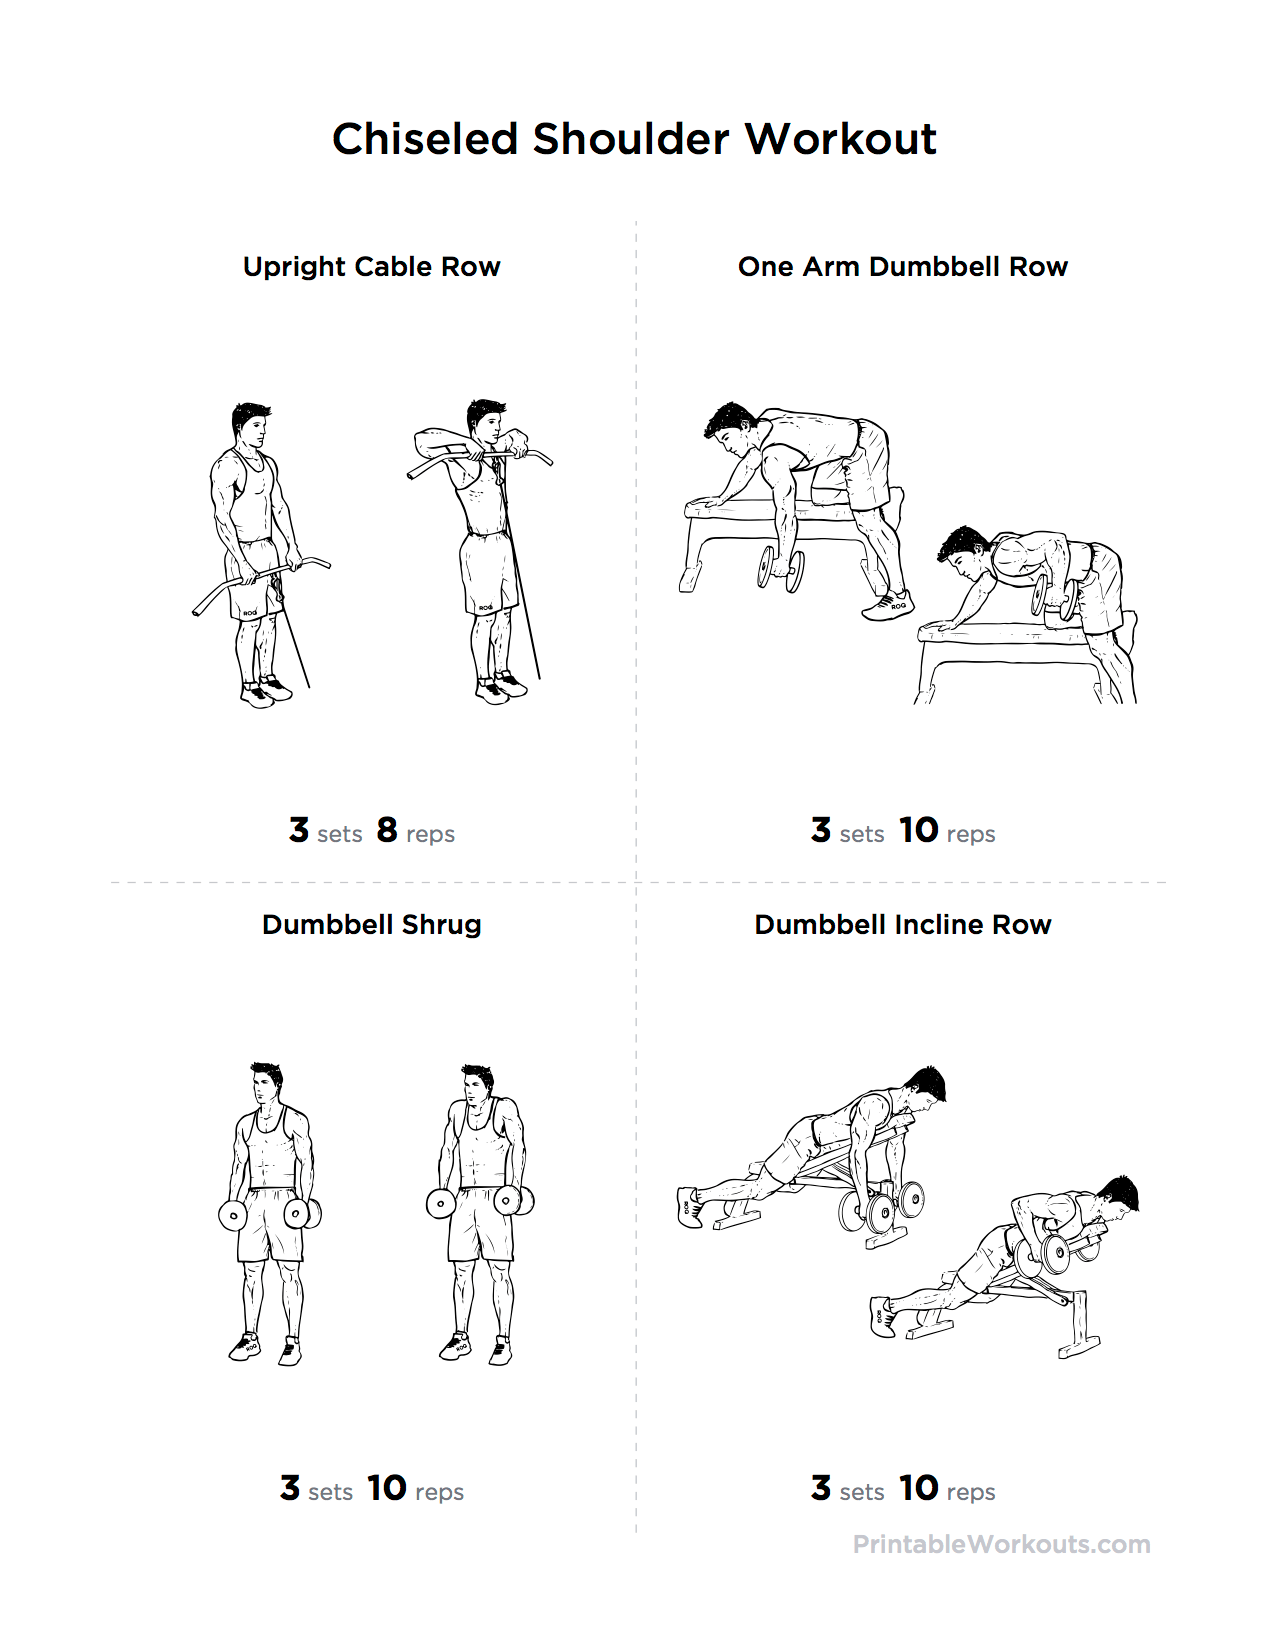 Printable Chiseled Shoulder Workout Create Free Custom Printable Workouts At Workoutlabs